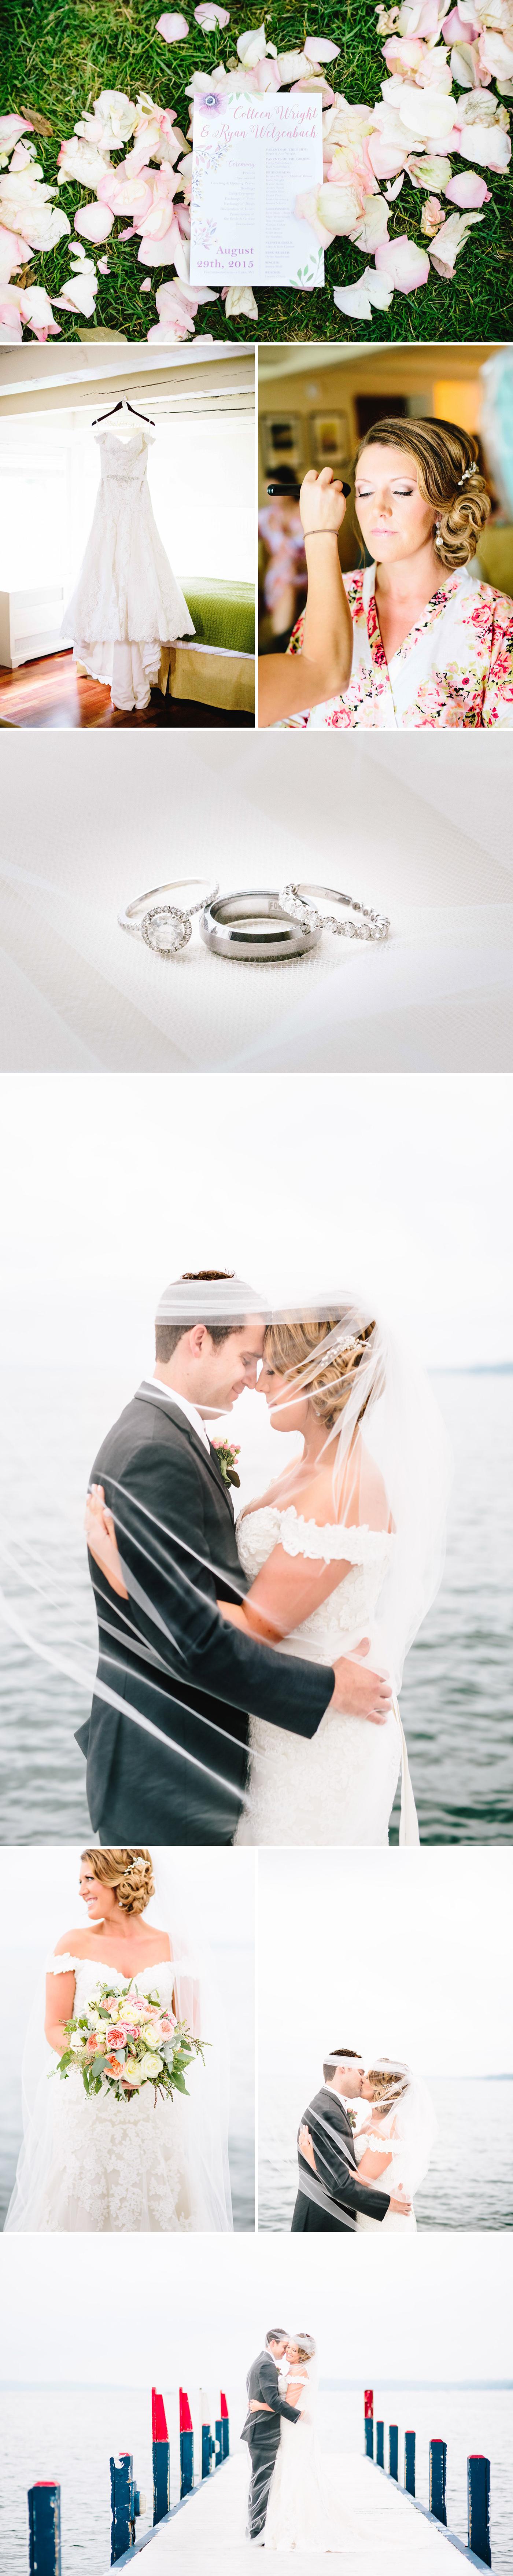 chicago-fine-art-wedding-photography-weizenbach1